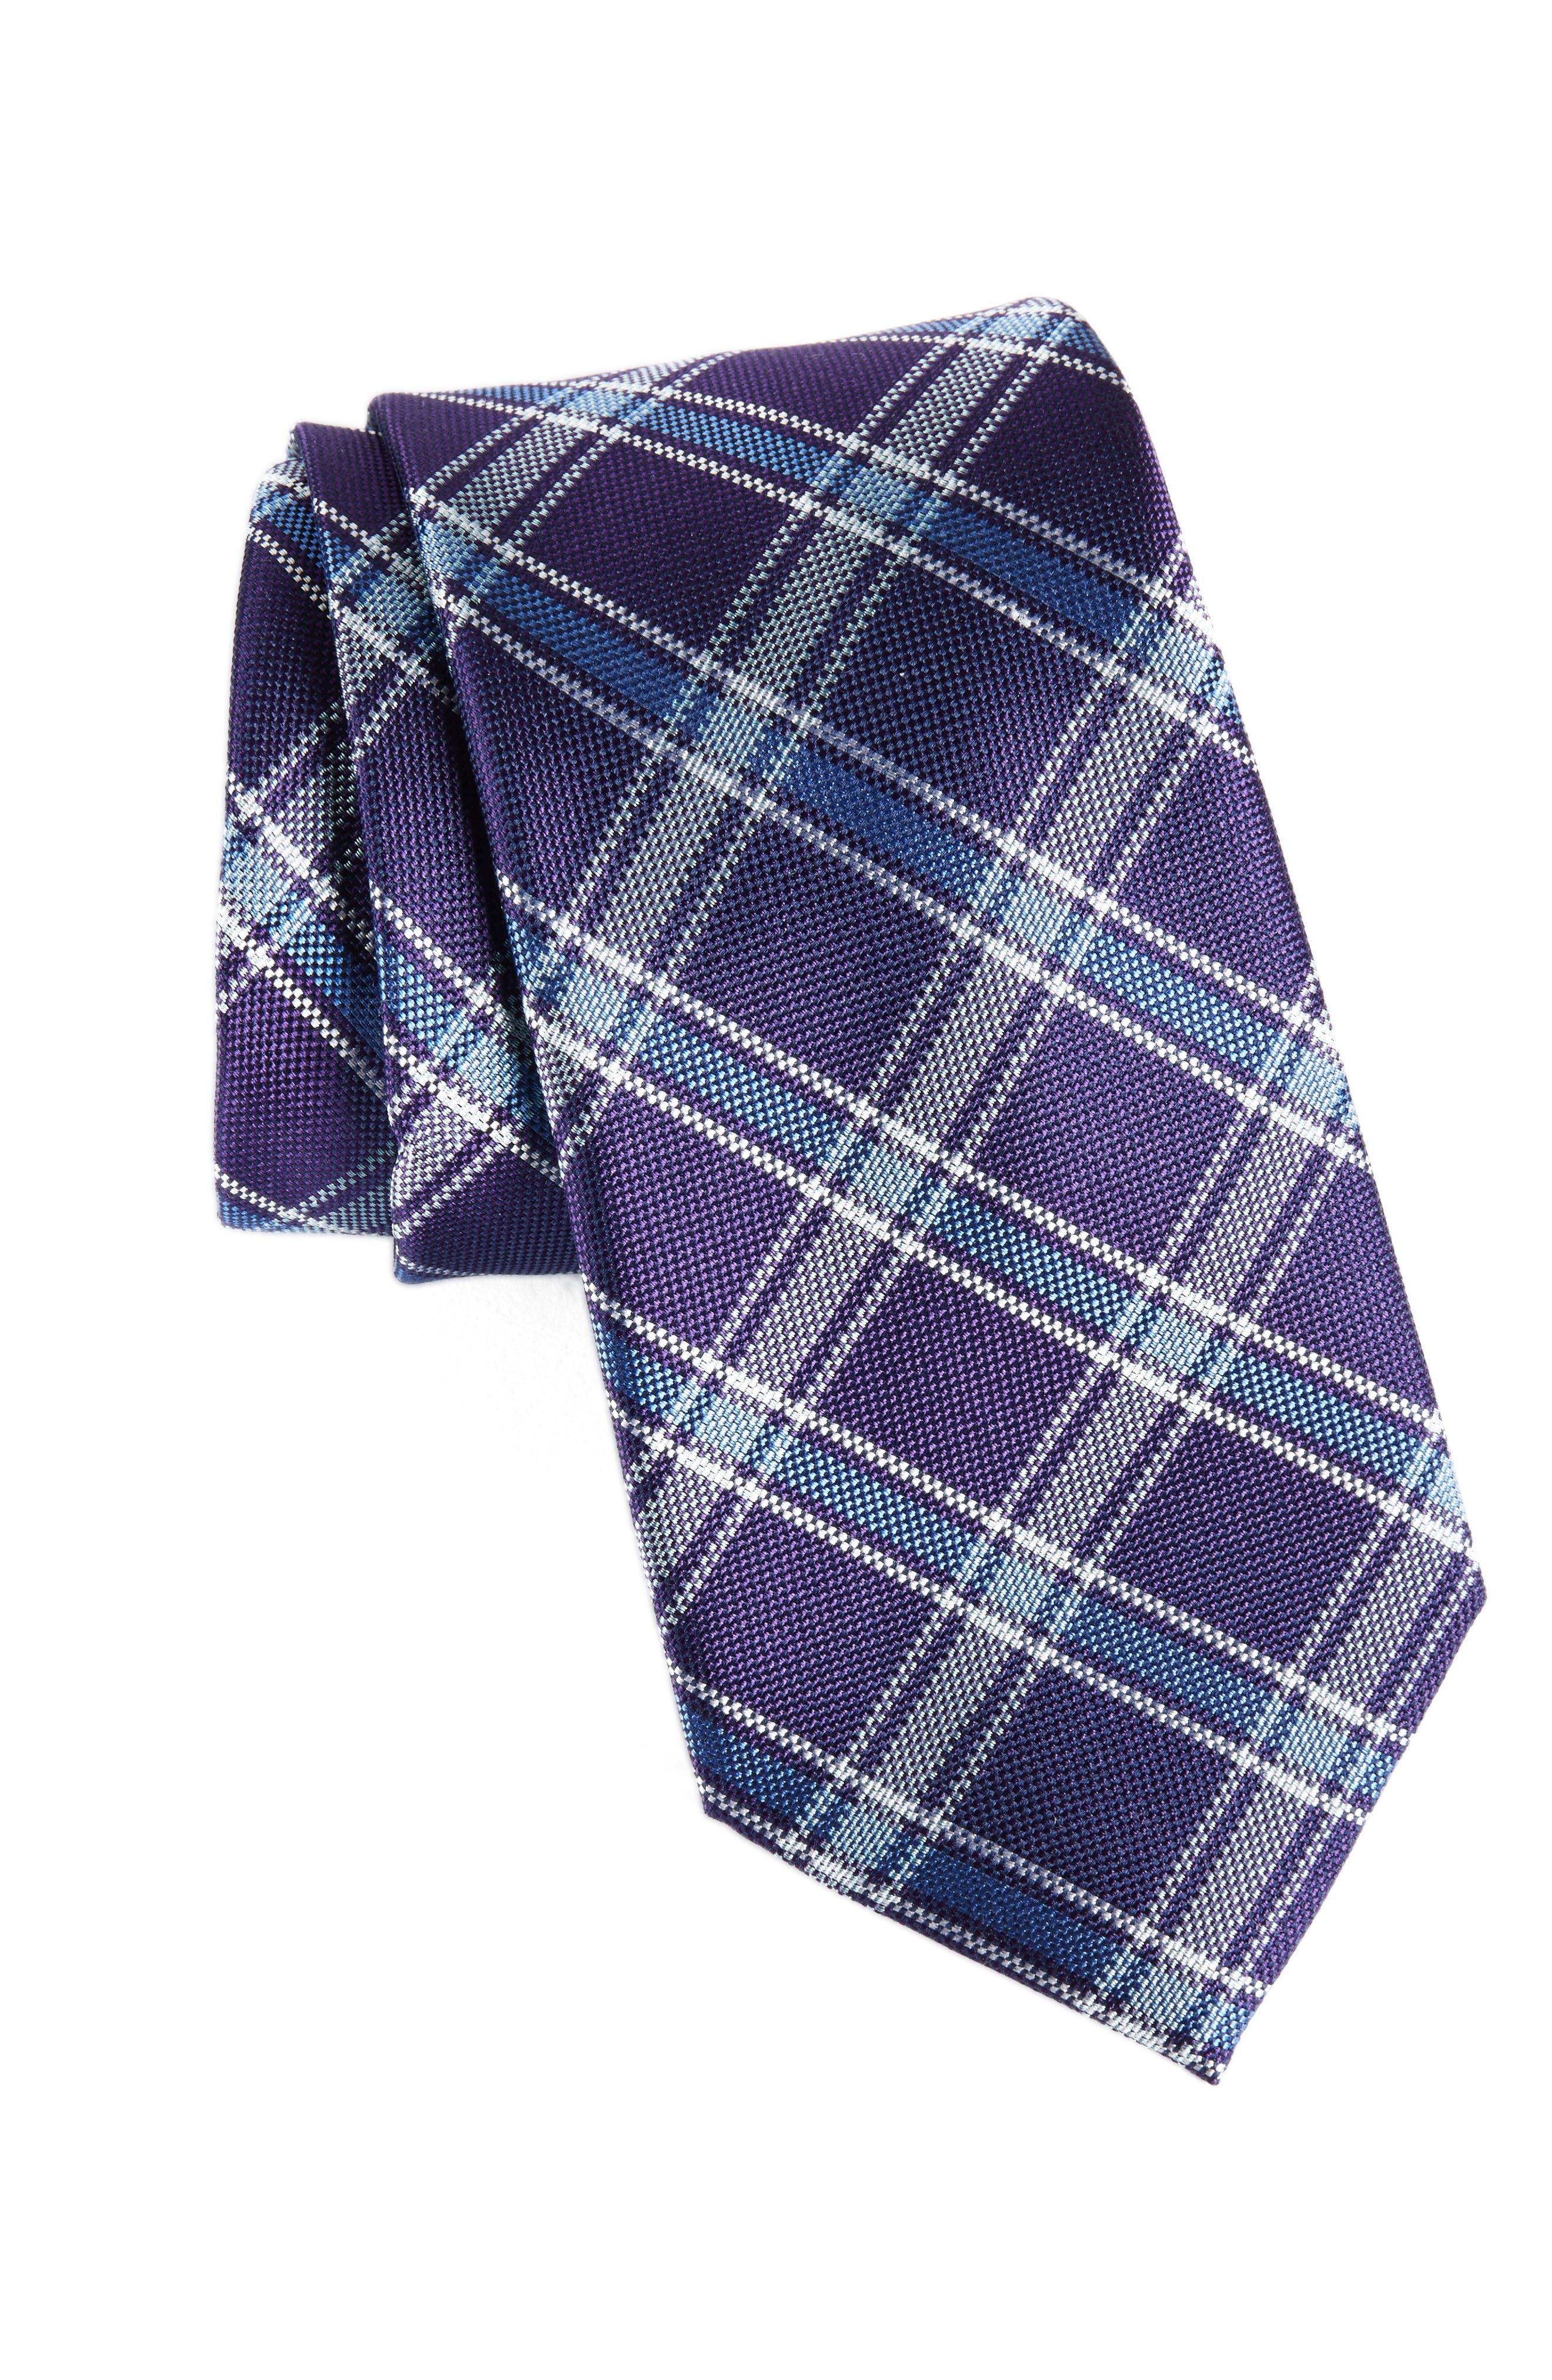 Nordstrom Men's Shop Oxford Plaid Silk Tie (X-Long)